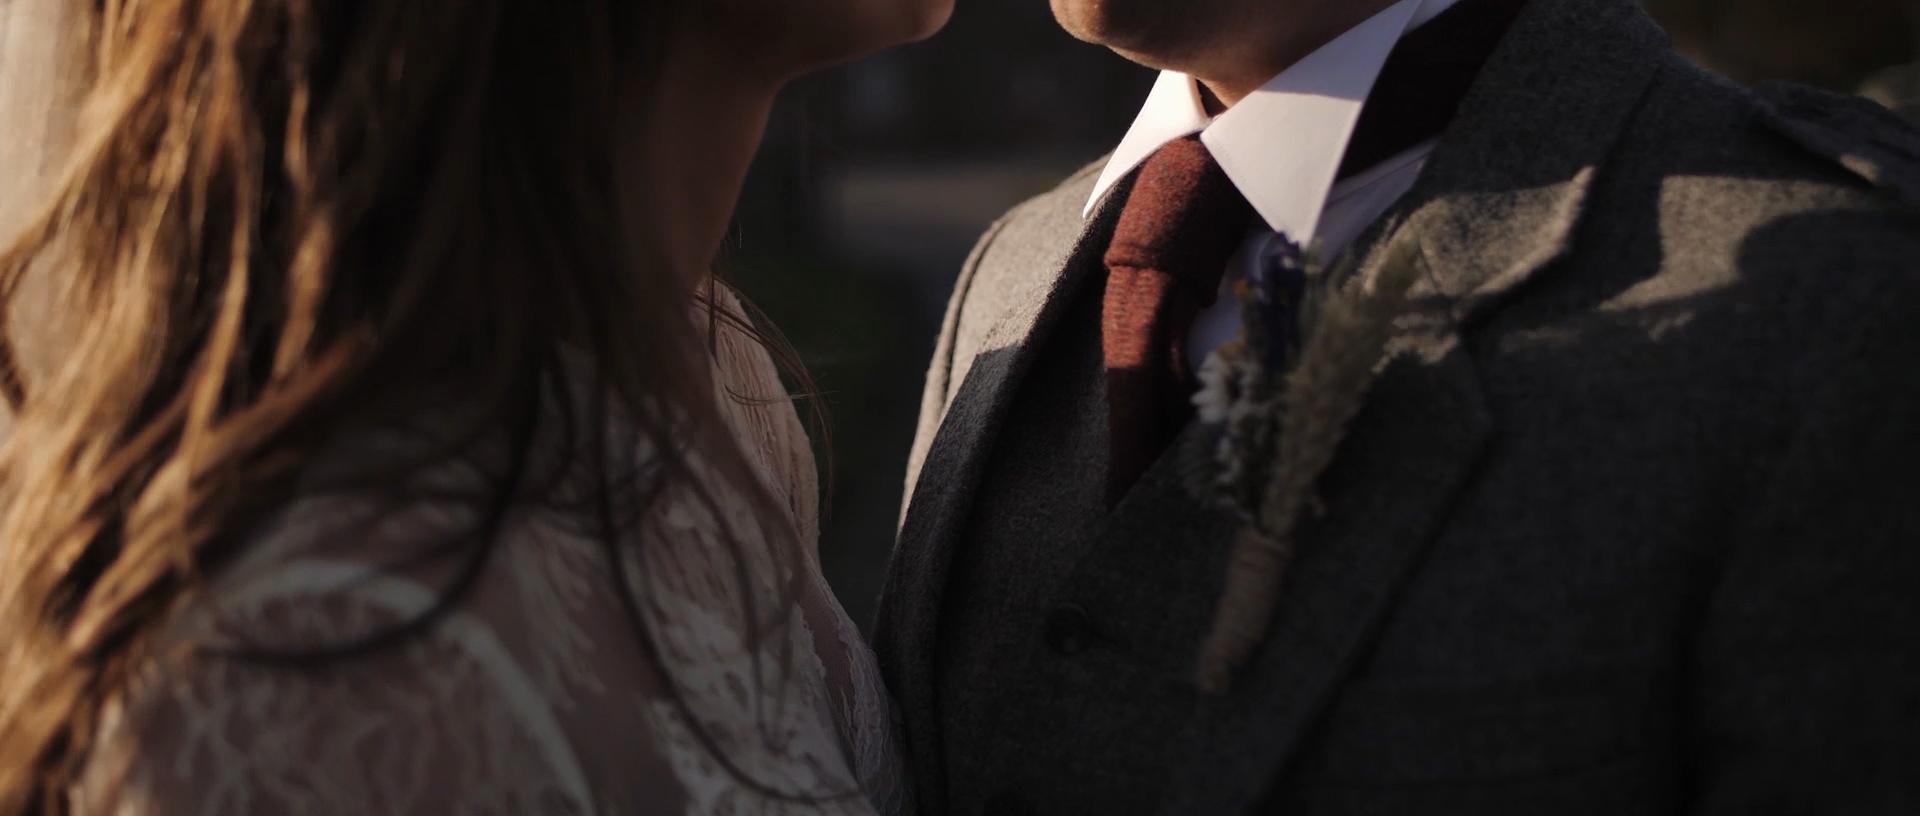 killearn-village-hall-wedding-videographer_LL_04.jpg